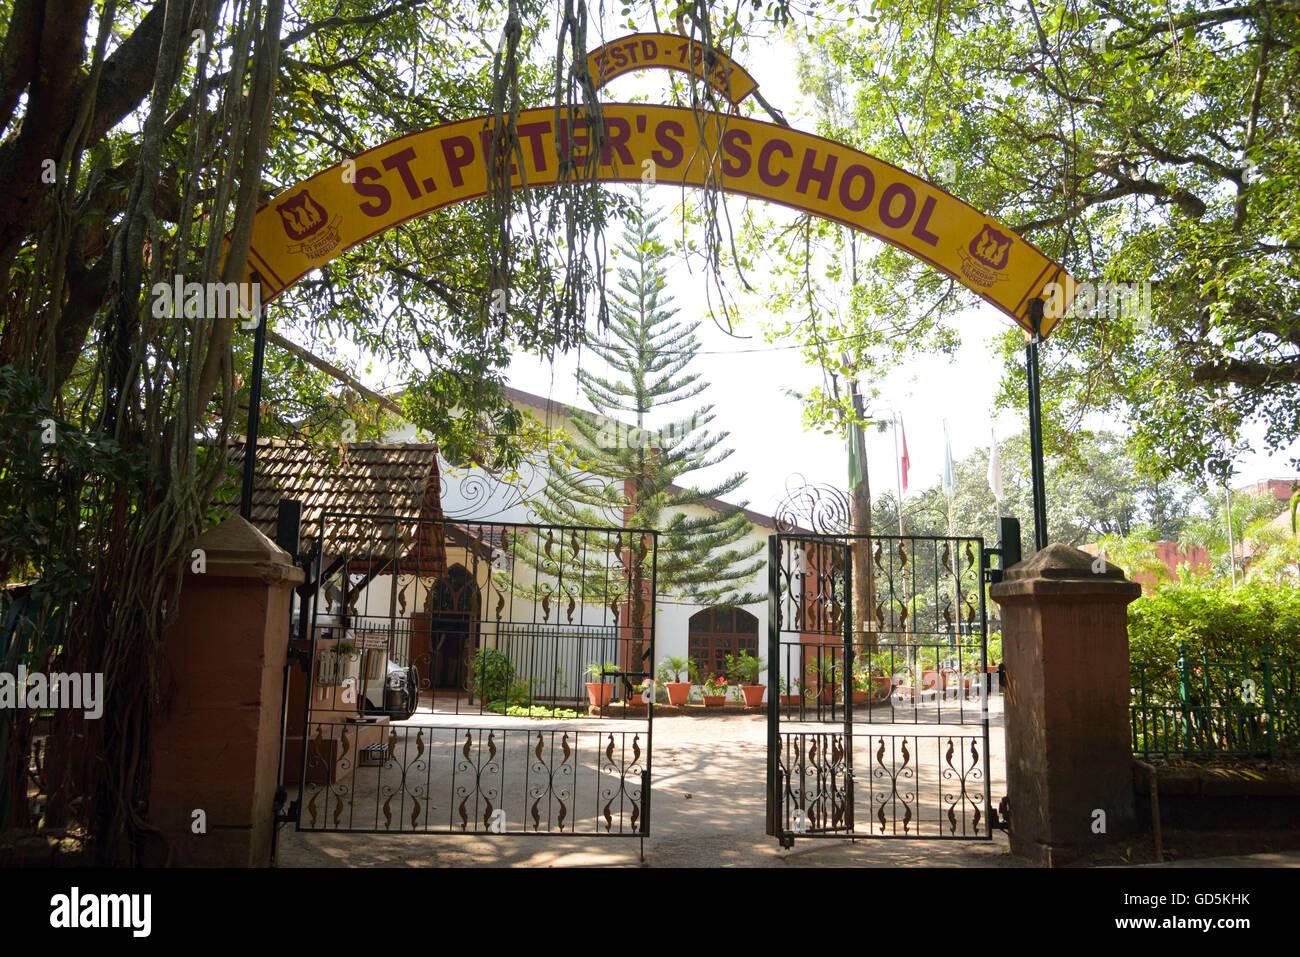 Sign board of st peter school, panchgani, satara, maharashtra, india, asia - Stock Image